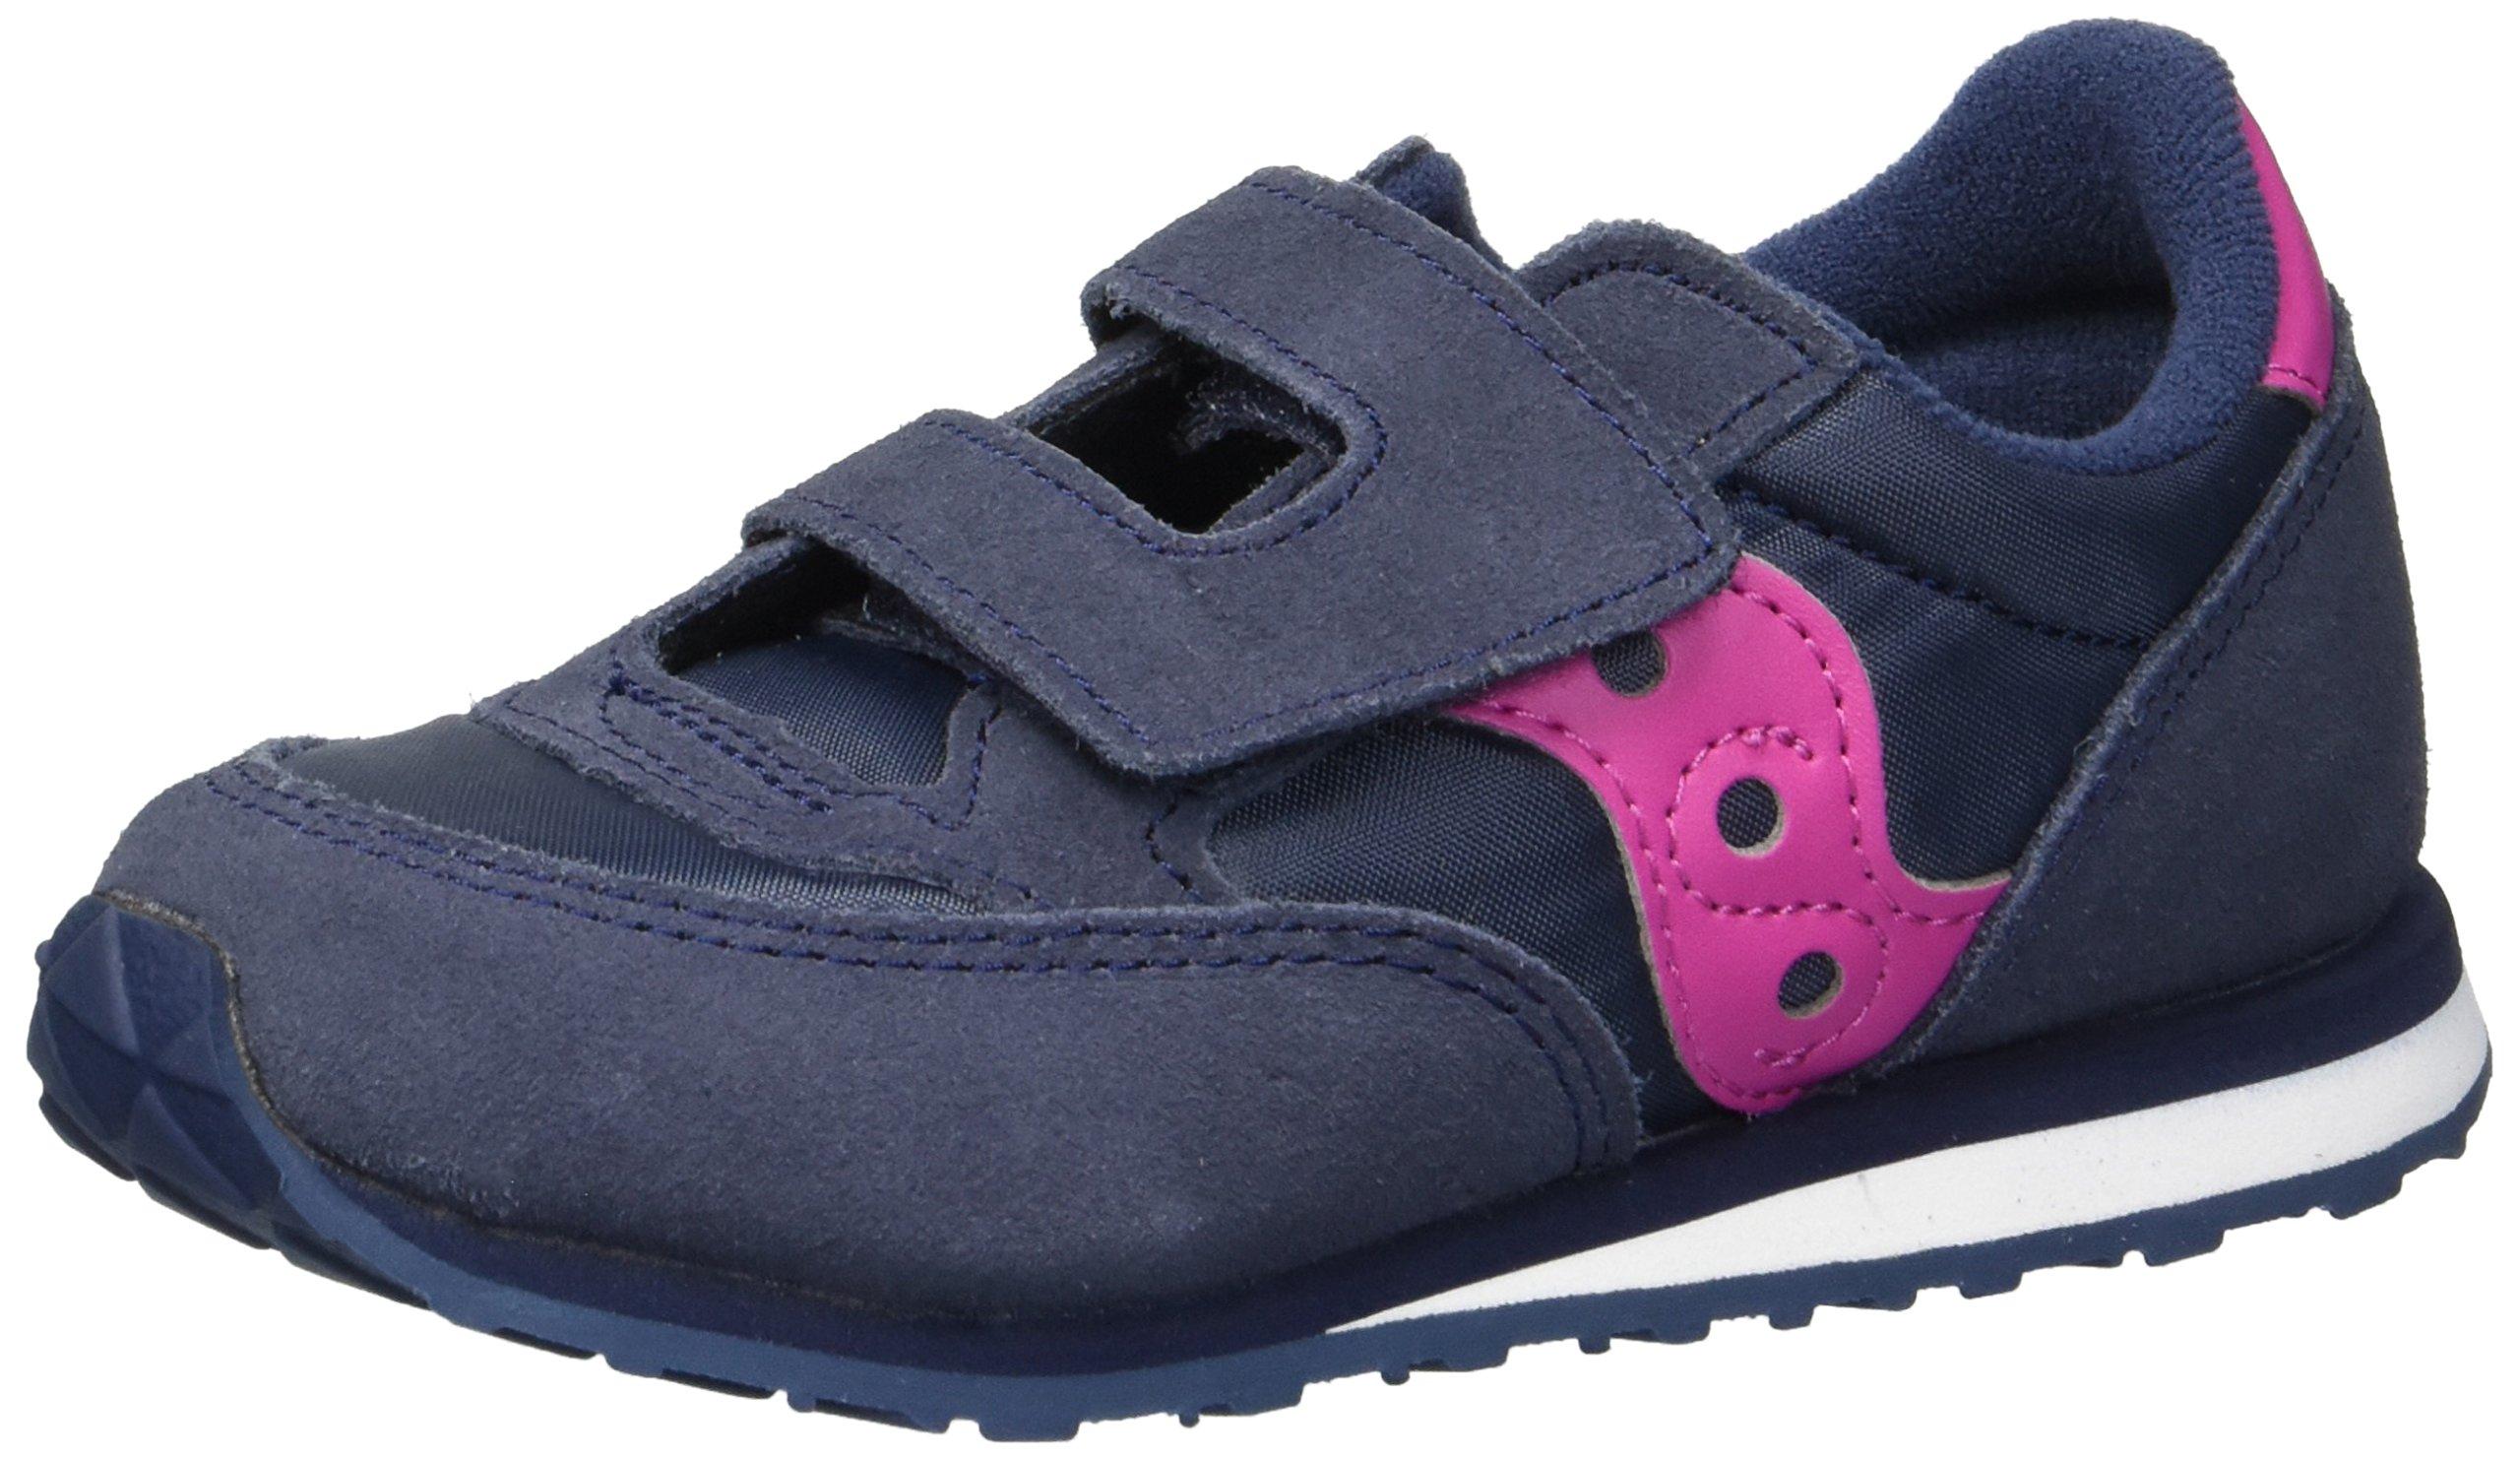 Saucony Girls' Baby Jazz HL Sneaker, Navy/Pink, 8 Medium US Toddler